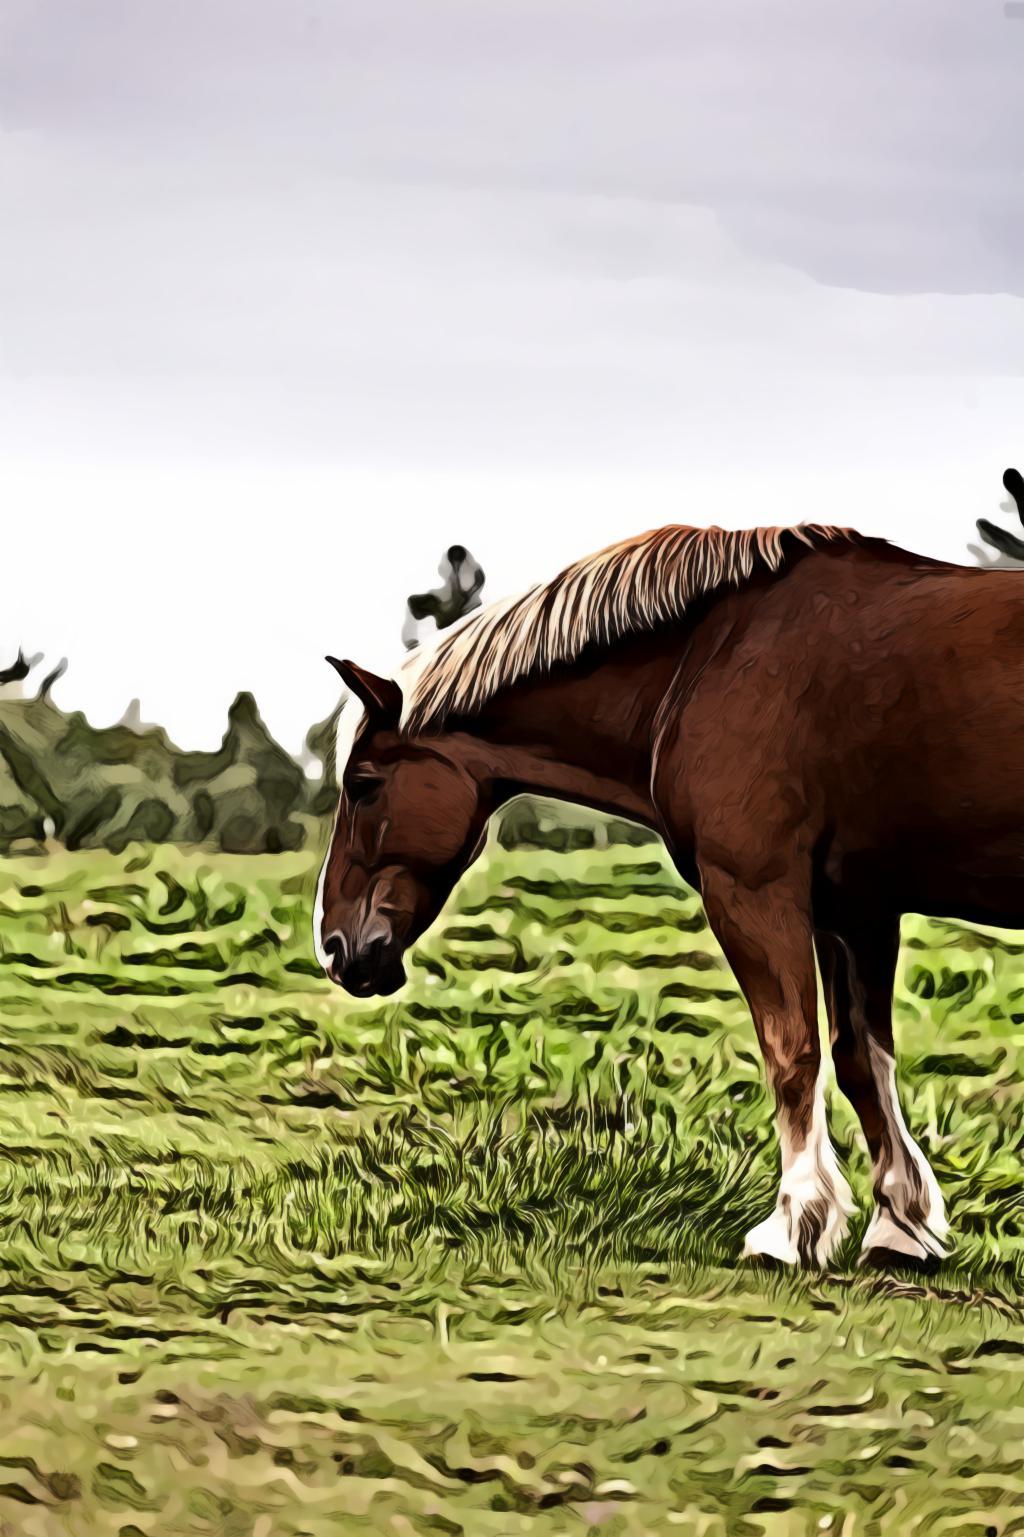 Horse on grass field